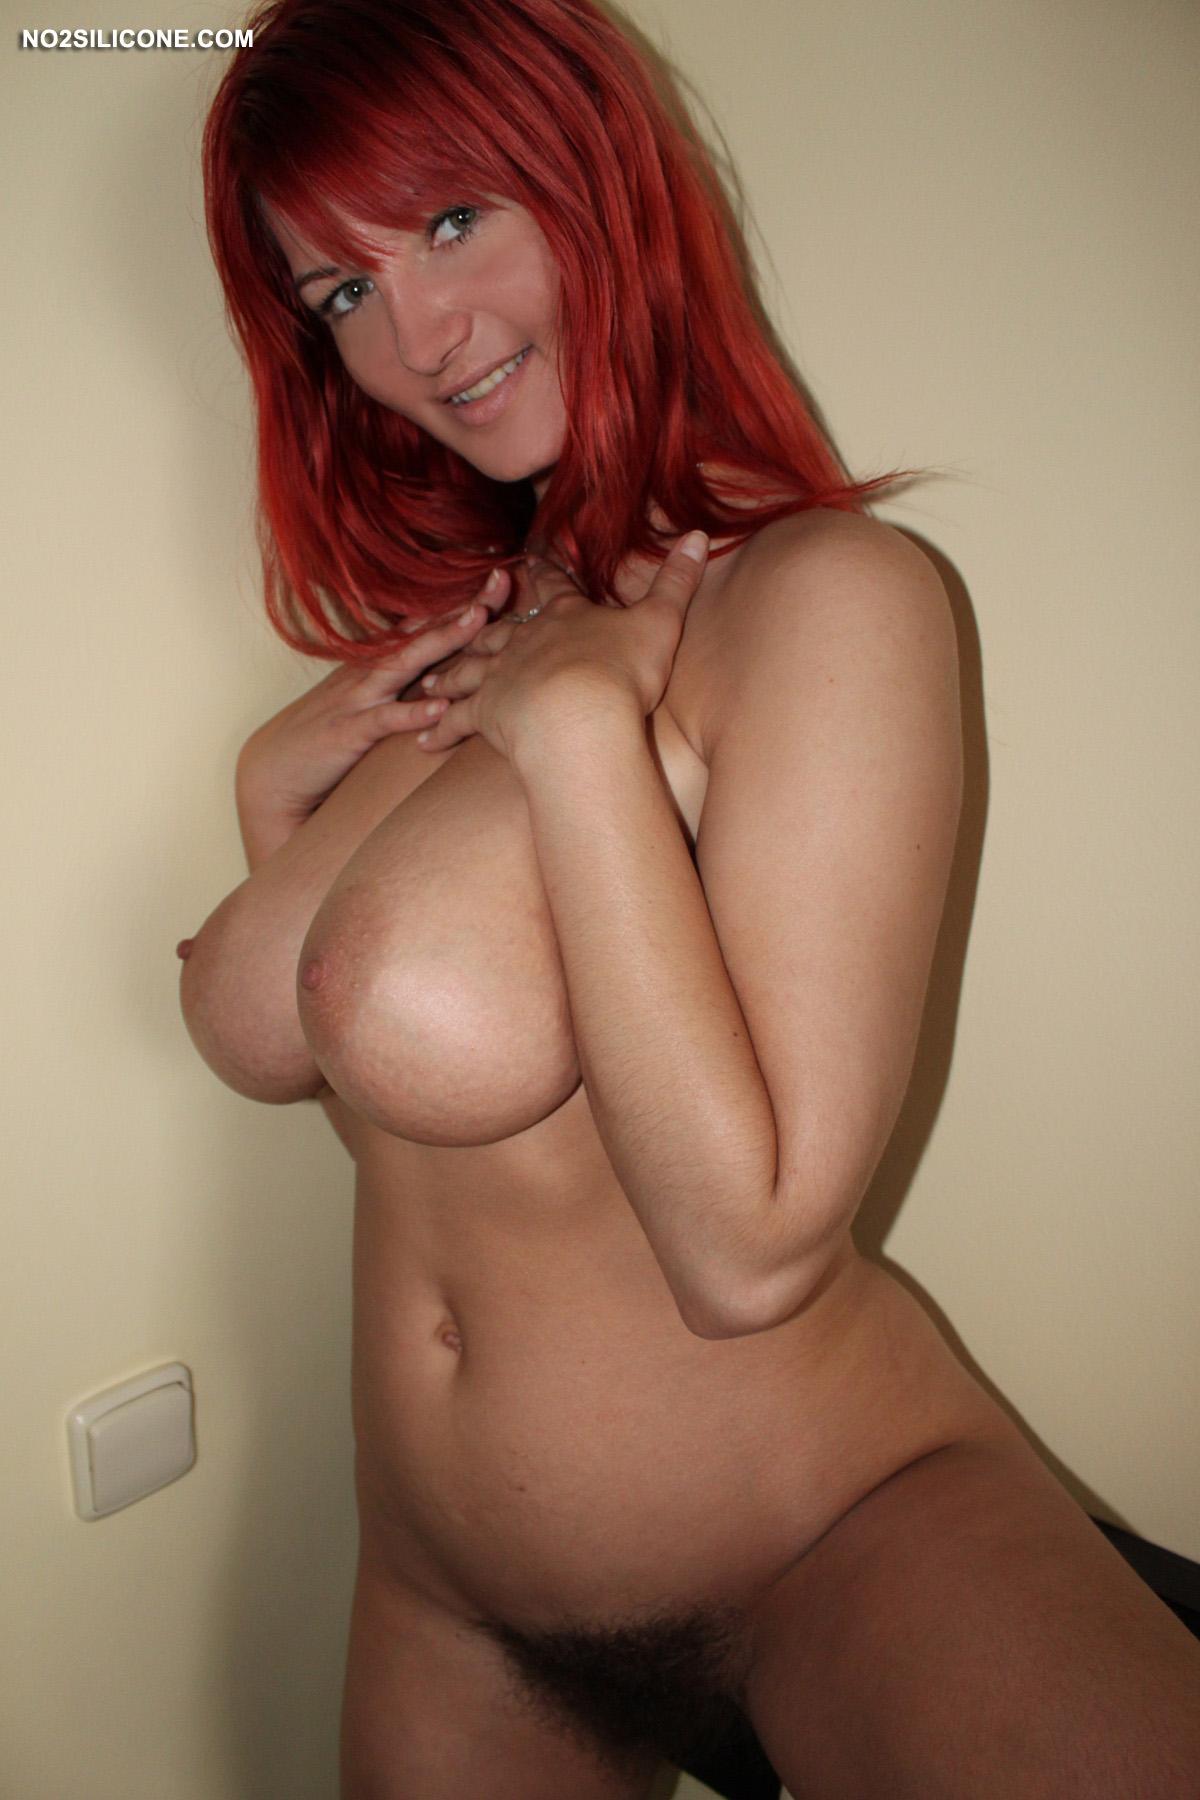 Curvy mature women big boobs redhead